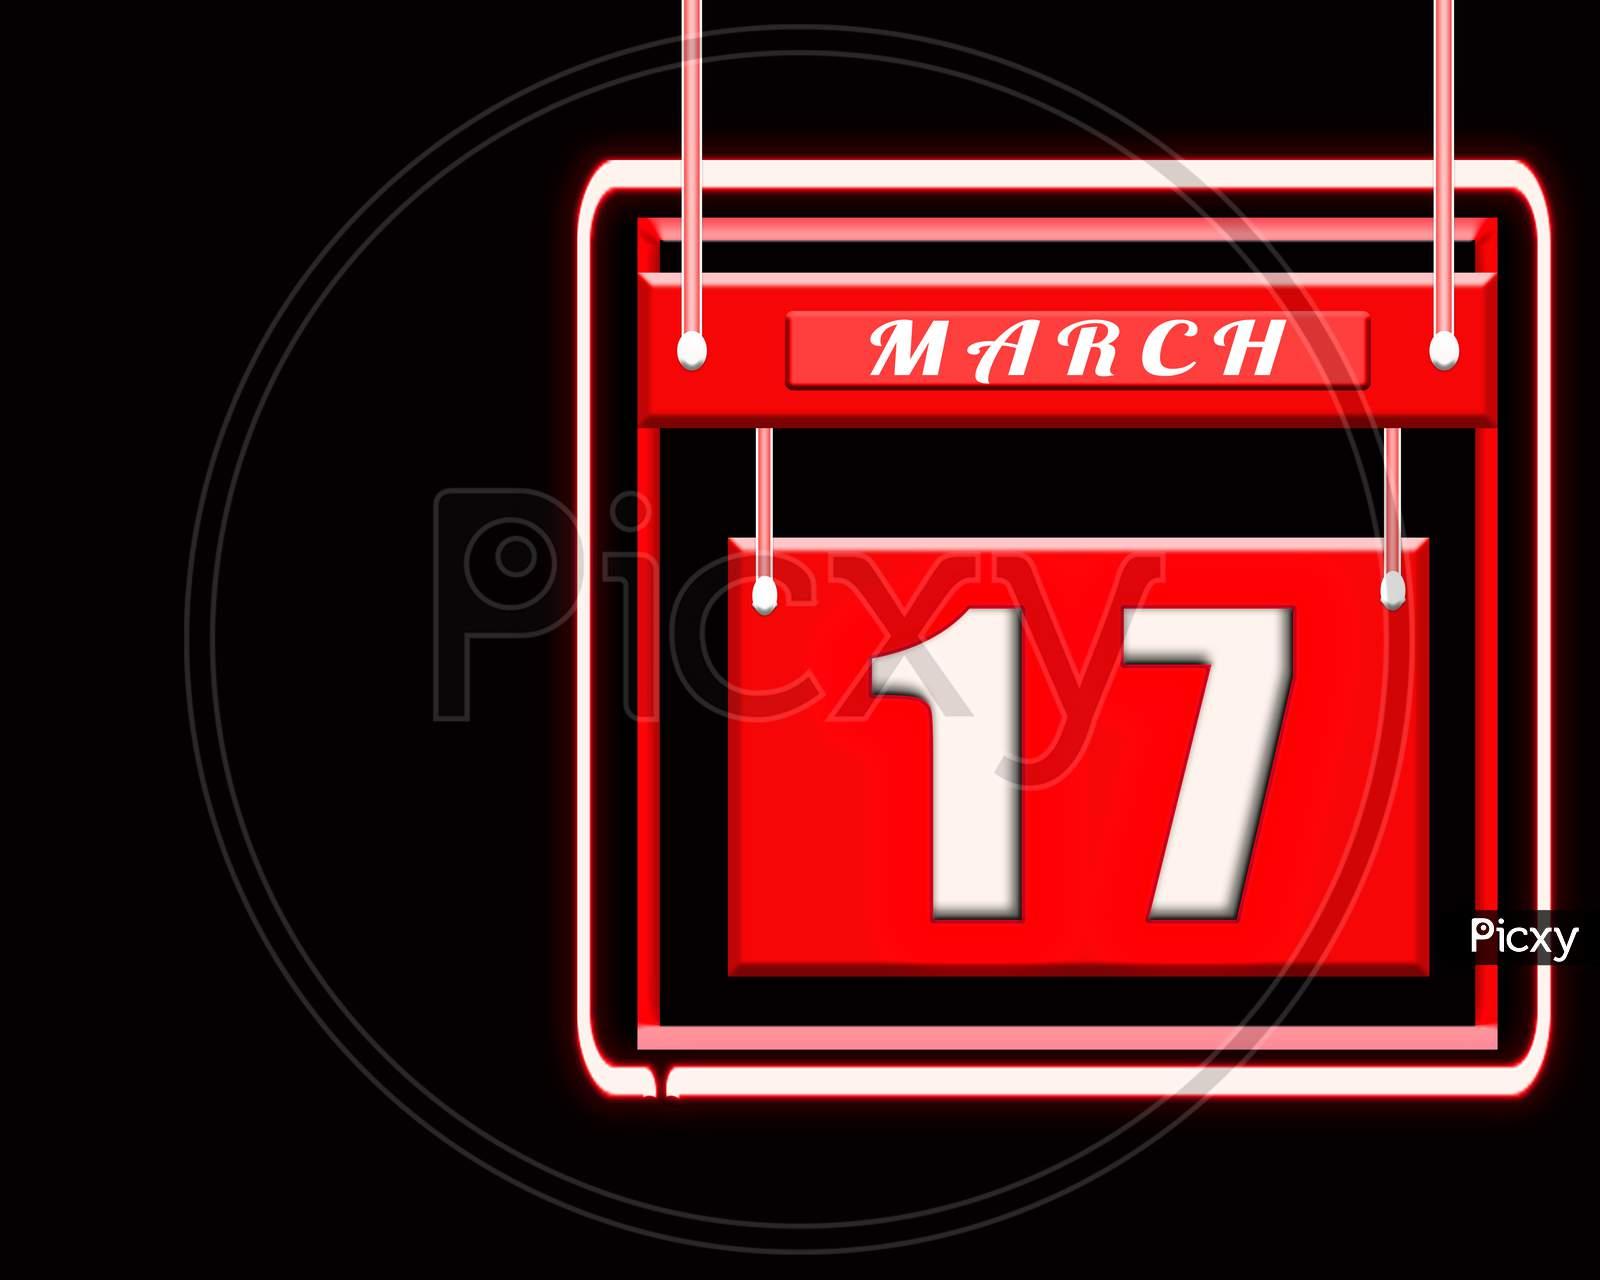 17 March, Red Calendar On Black Backgrand